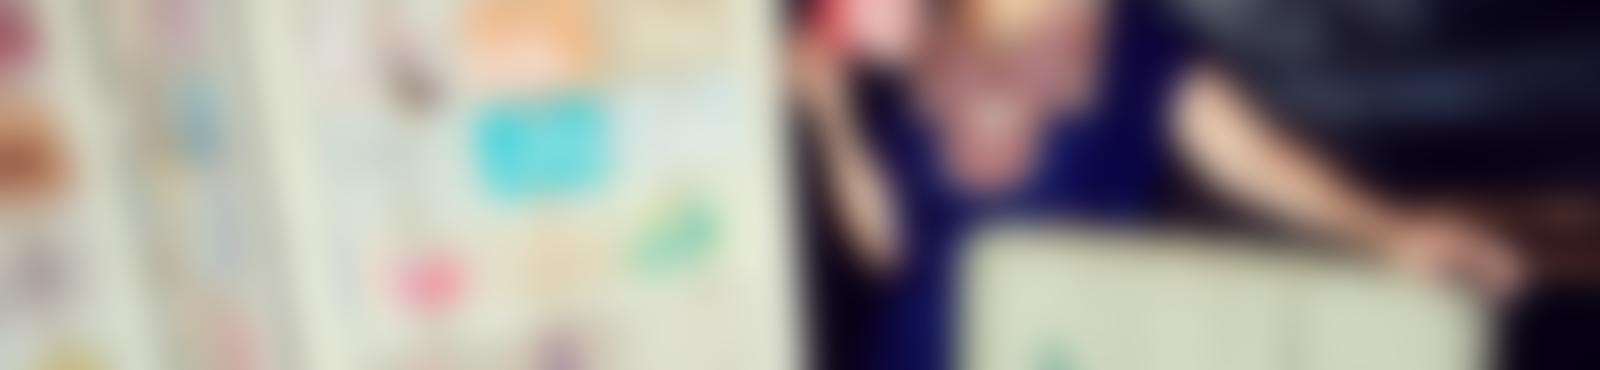 Blurred de666036 fa2f 48d8 80a4 dcb0dd9ab553